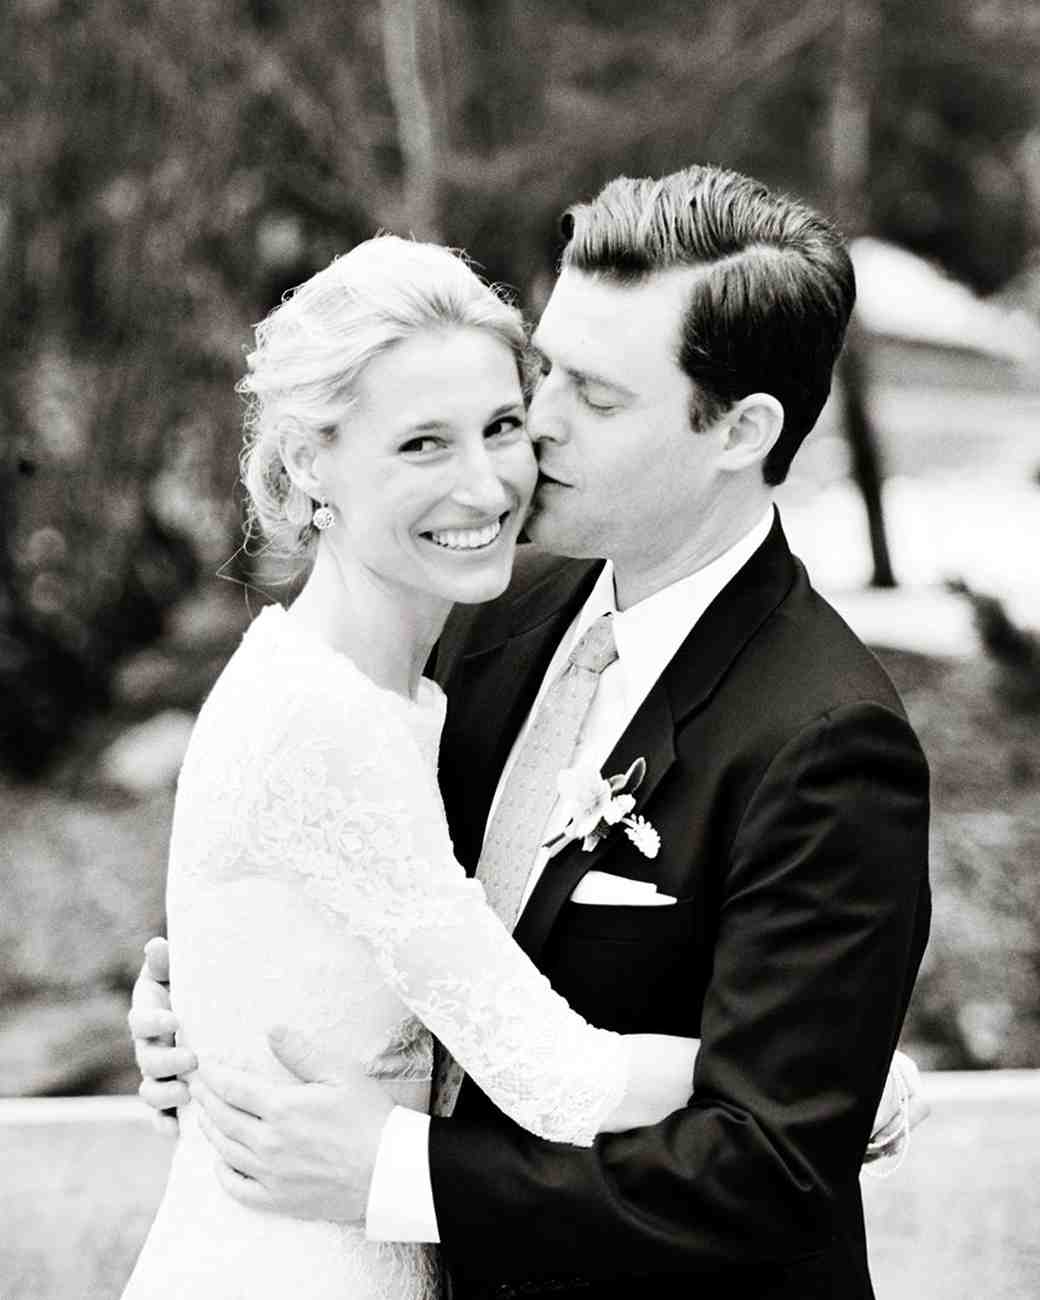 wedding-day-photography-tips-8-0216.jpg